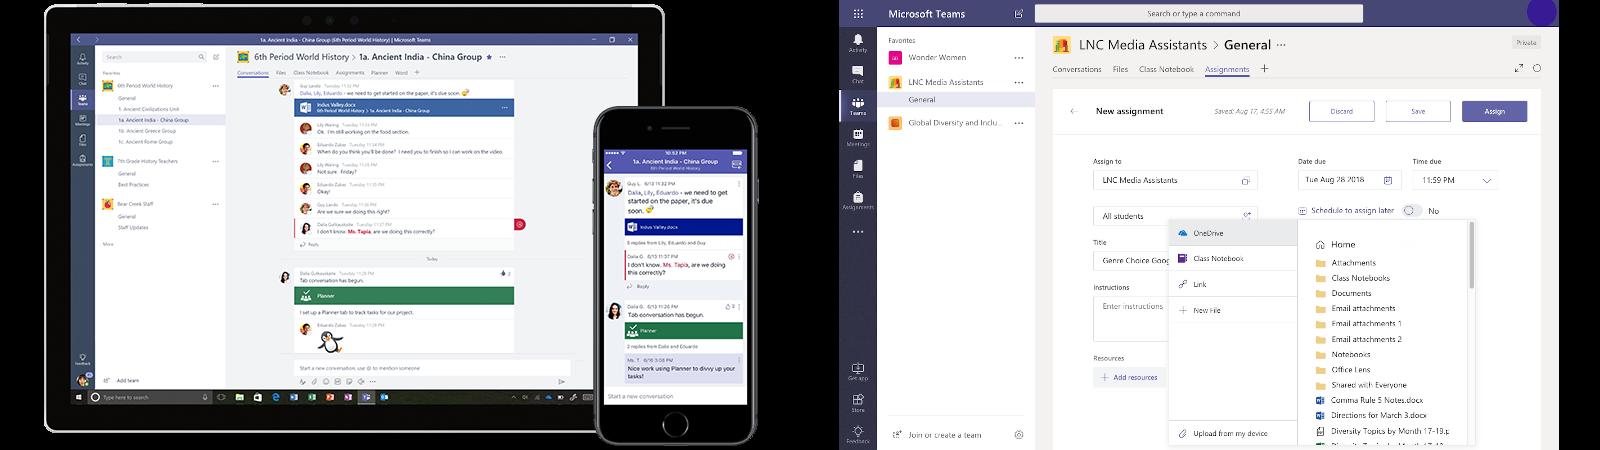 Two screenshots show the Microsoft Teams application